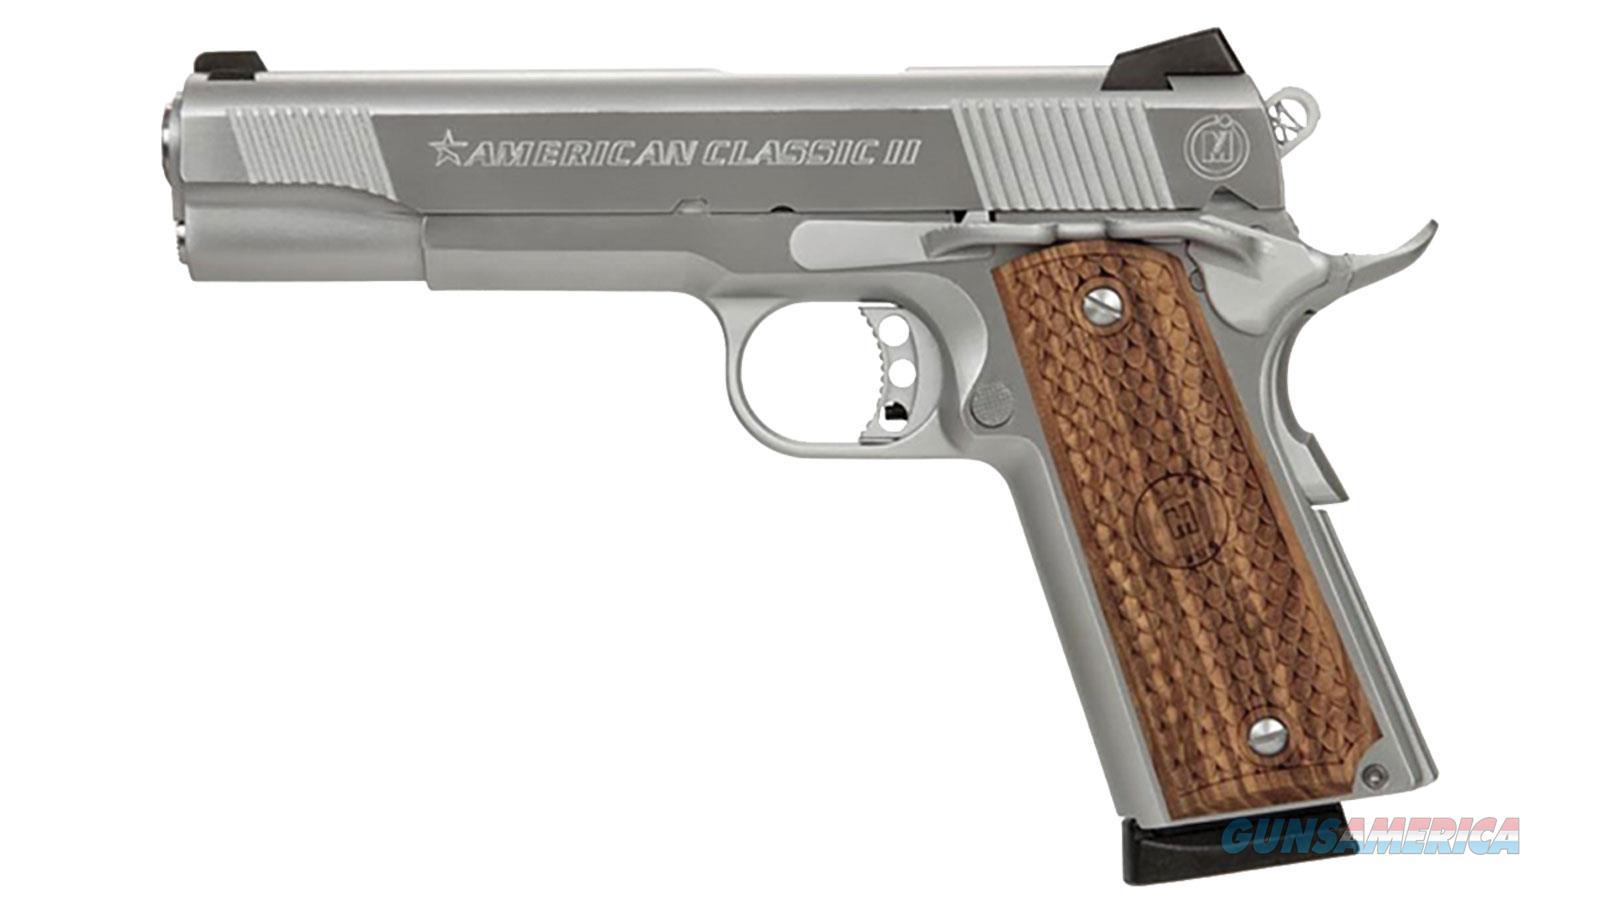 Import Sports Ii 45Acp 5 AC45G2C  Guns > Pistols > IJ Misc Pistols